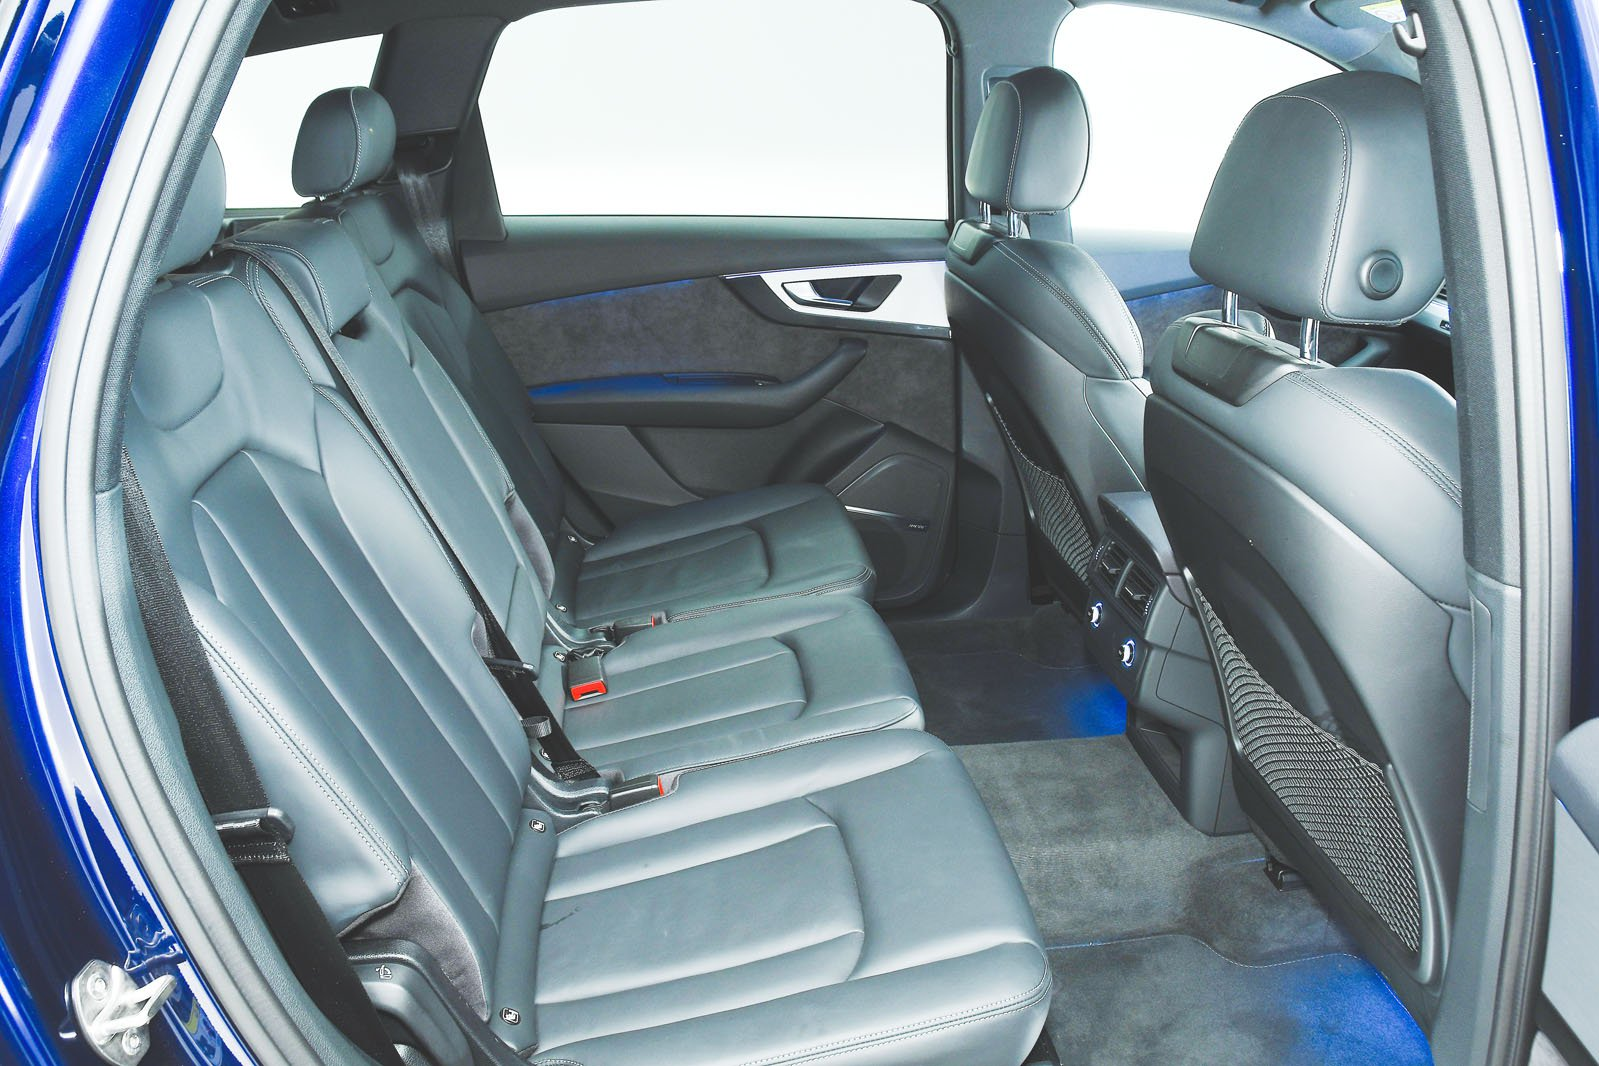 Audi Q7 front seats